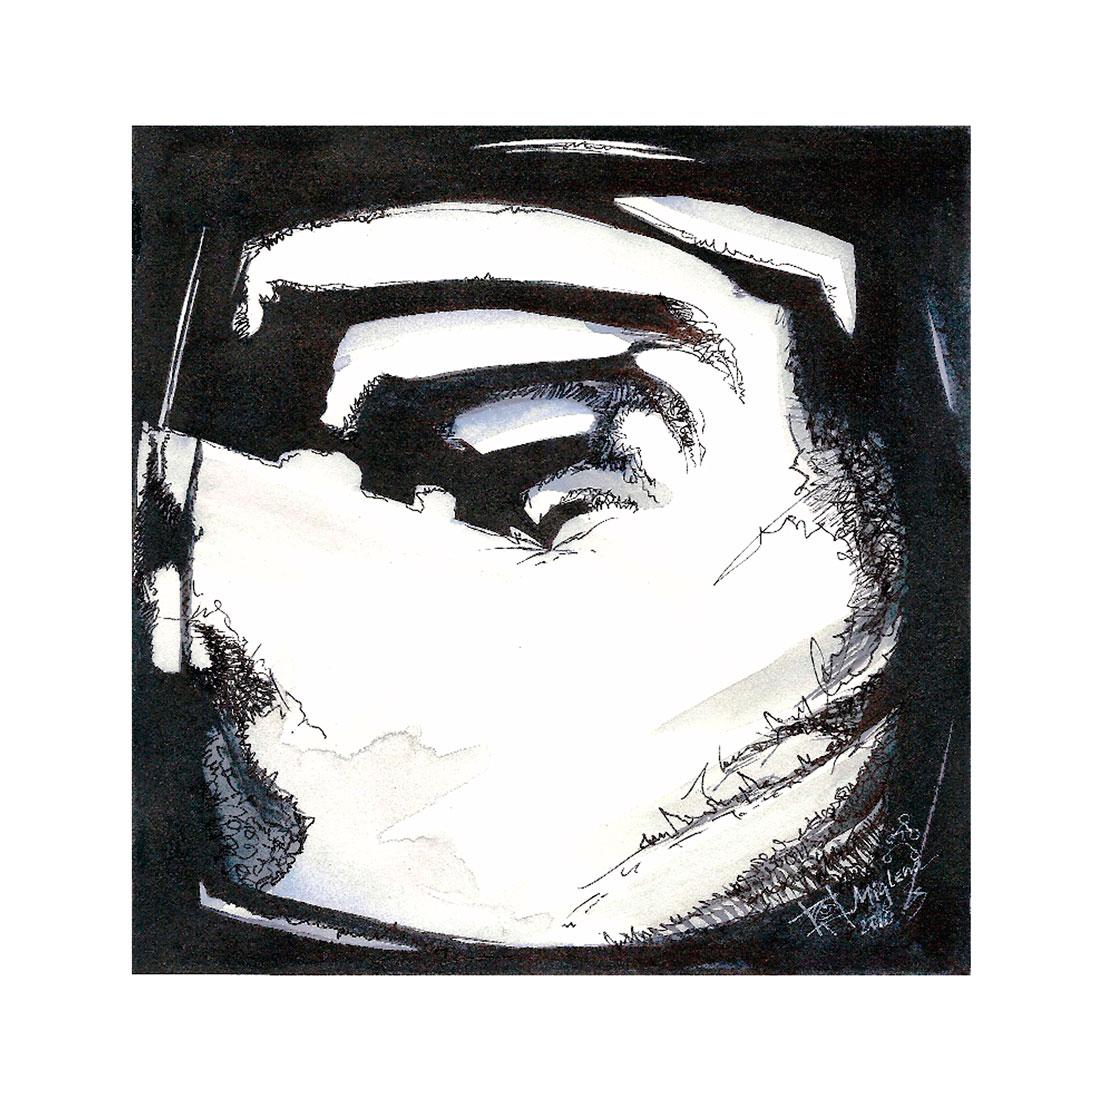 introspection V, 2010, 20x20cm.